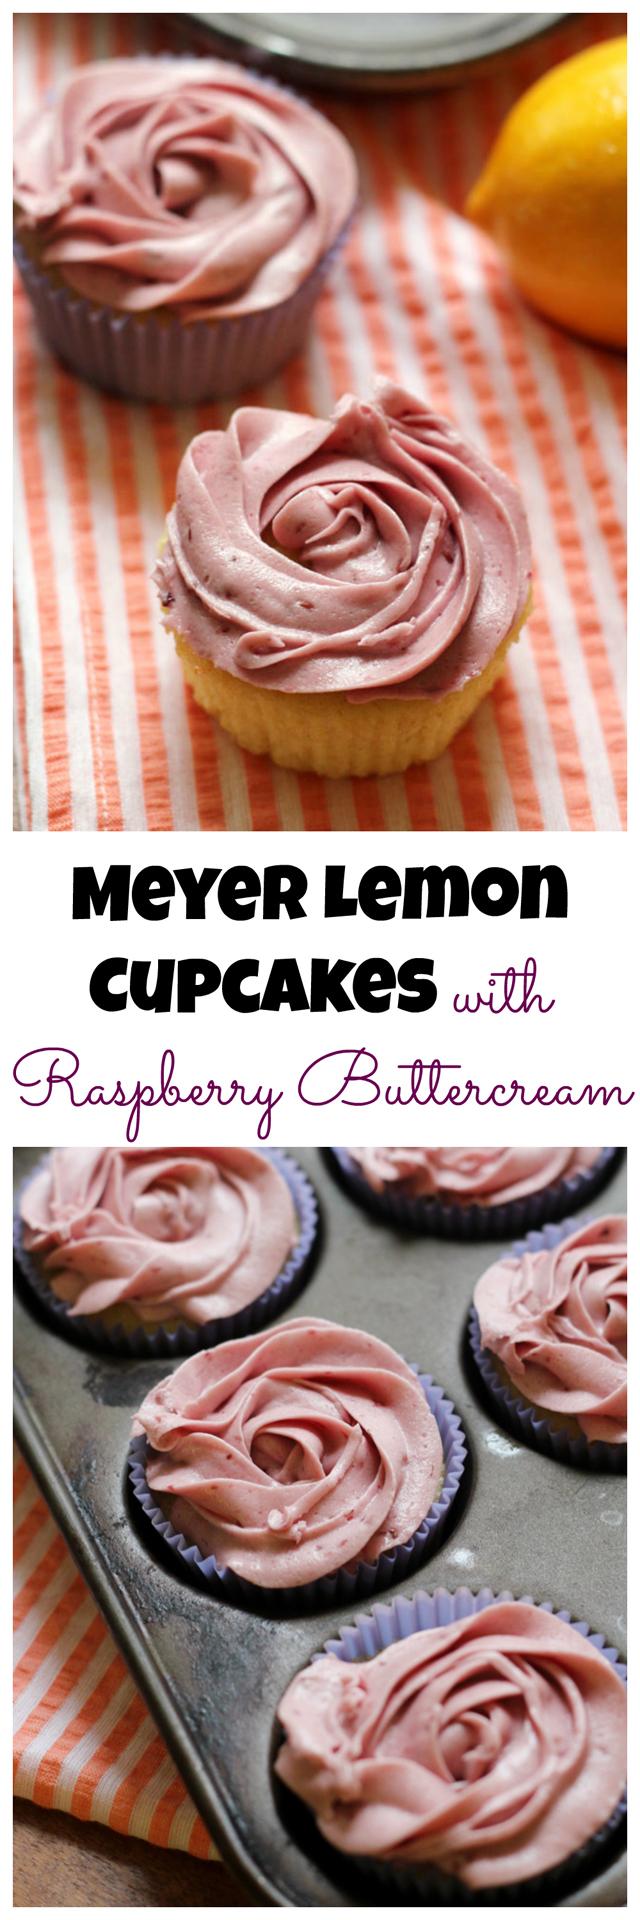 meyer lemon cupcakes with raspberry buttercream